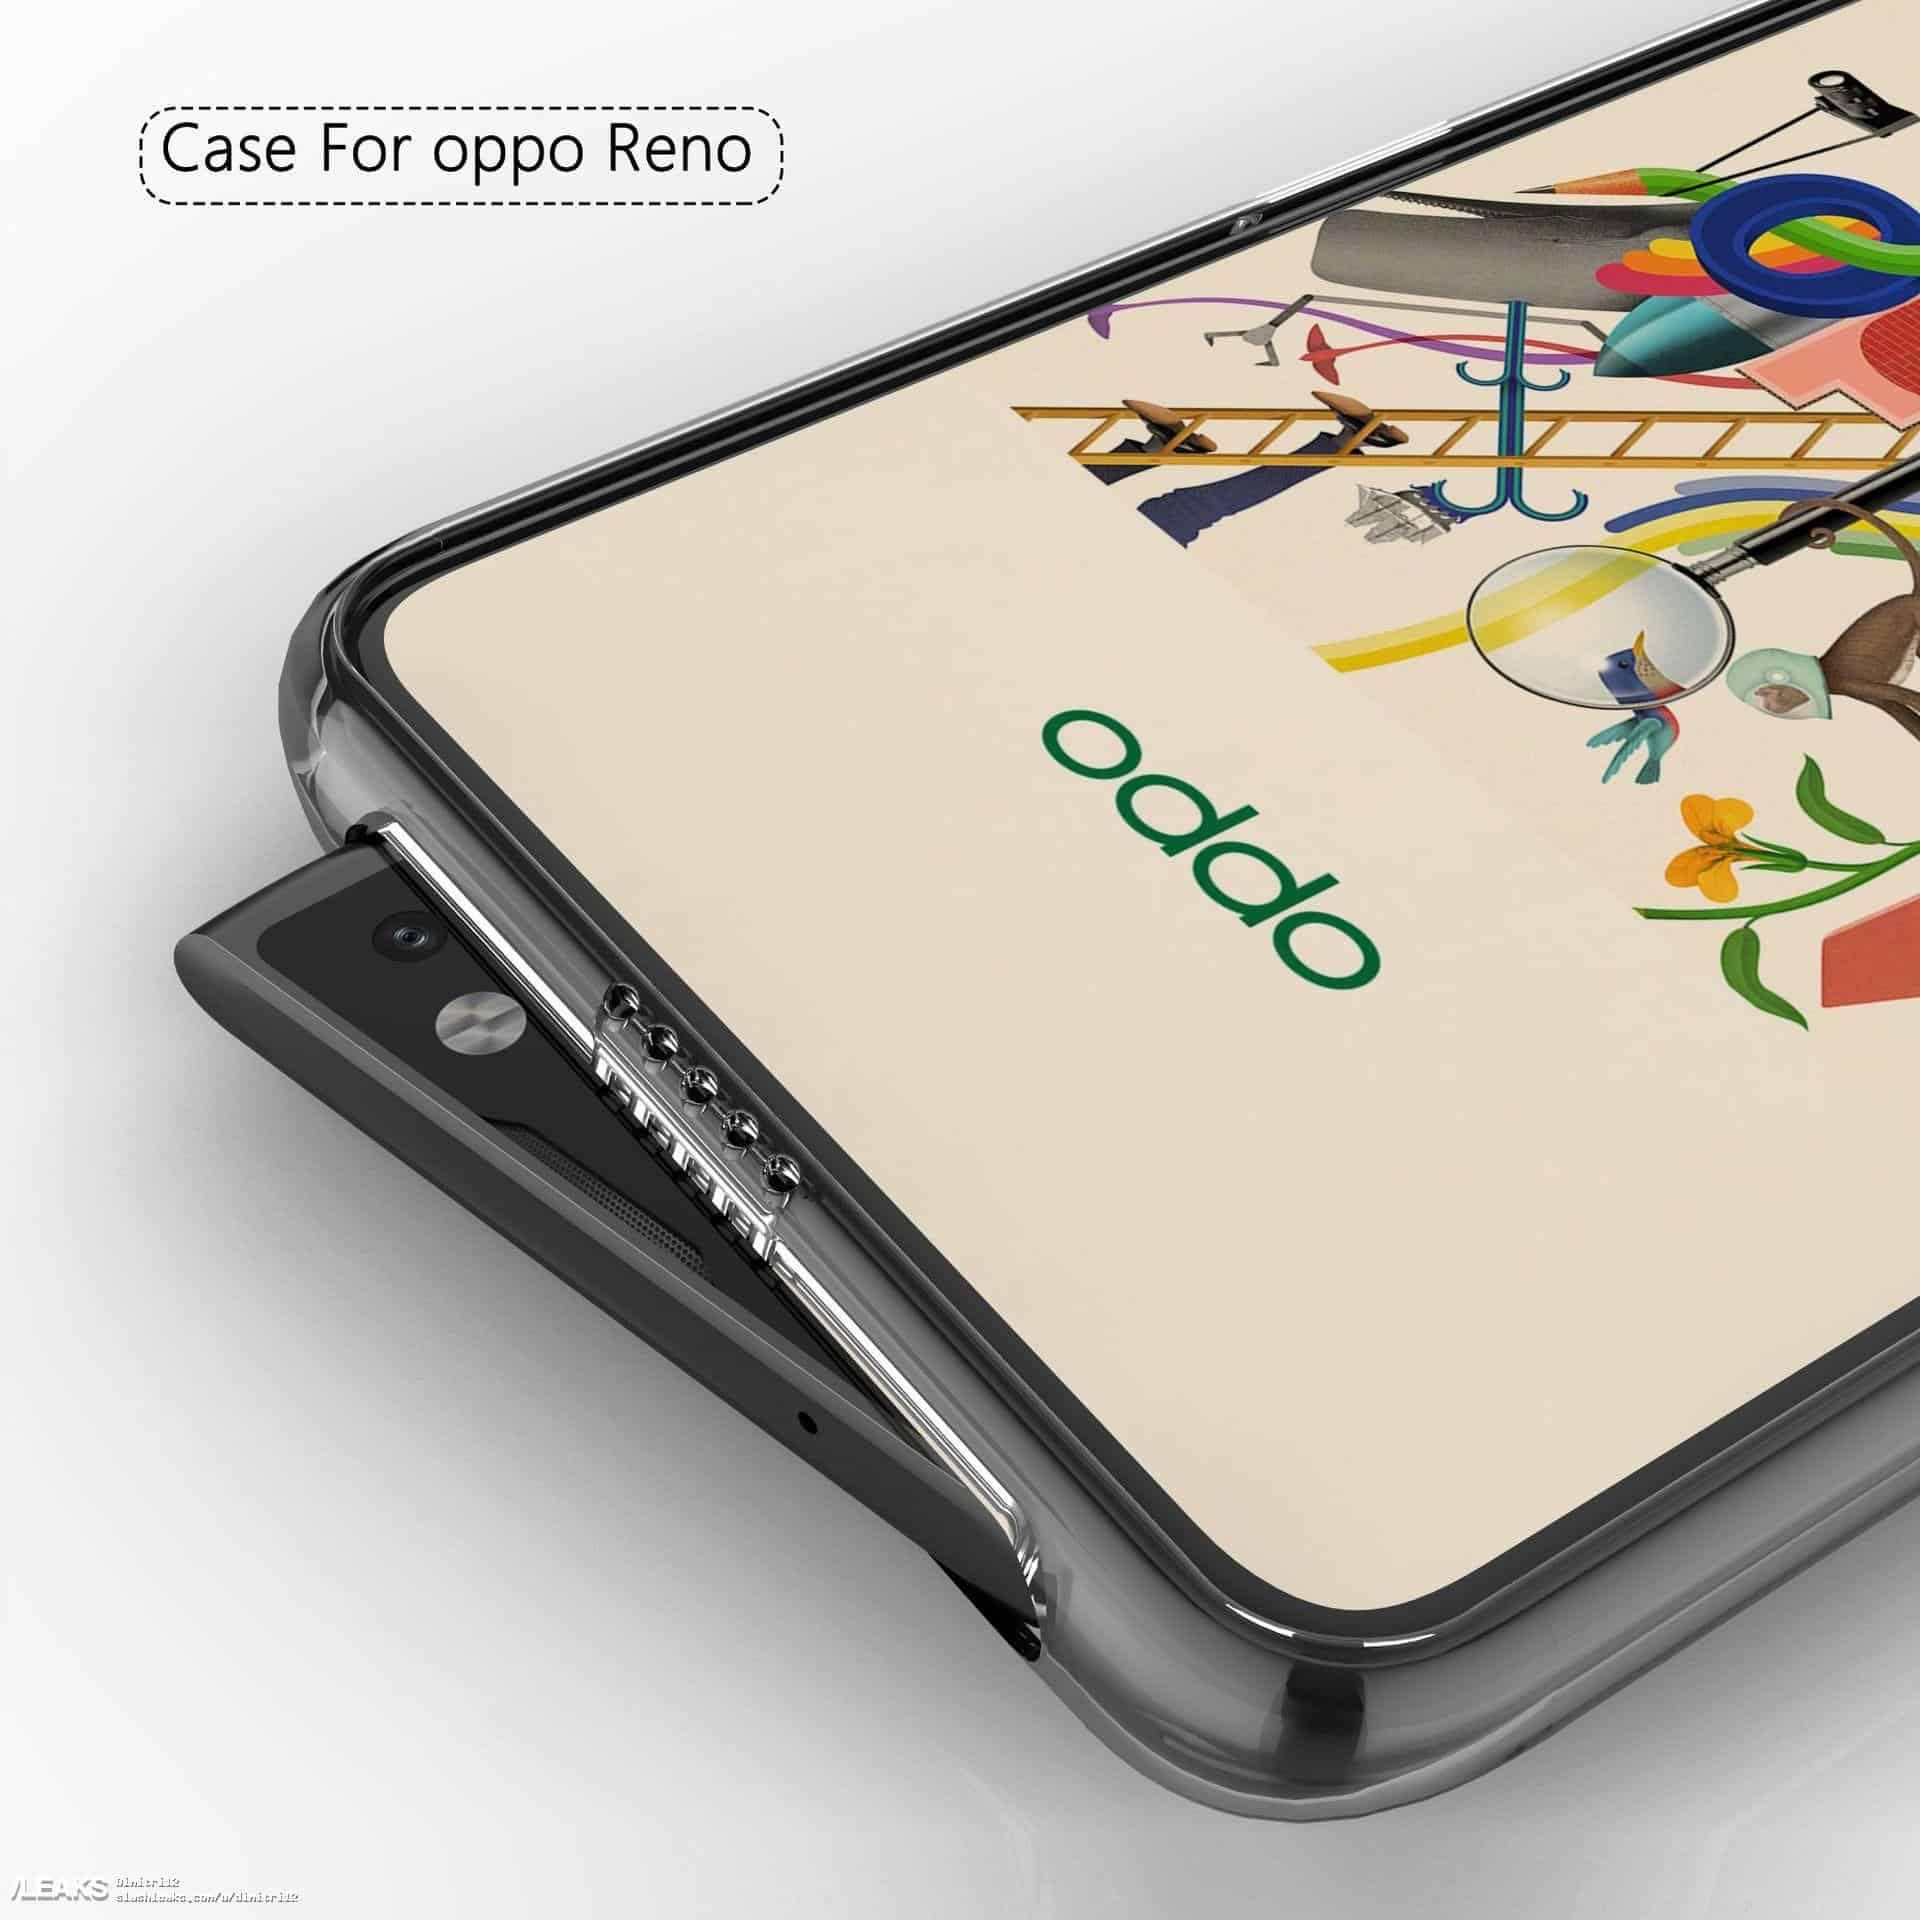 OPPO-Reno-case-renders-c